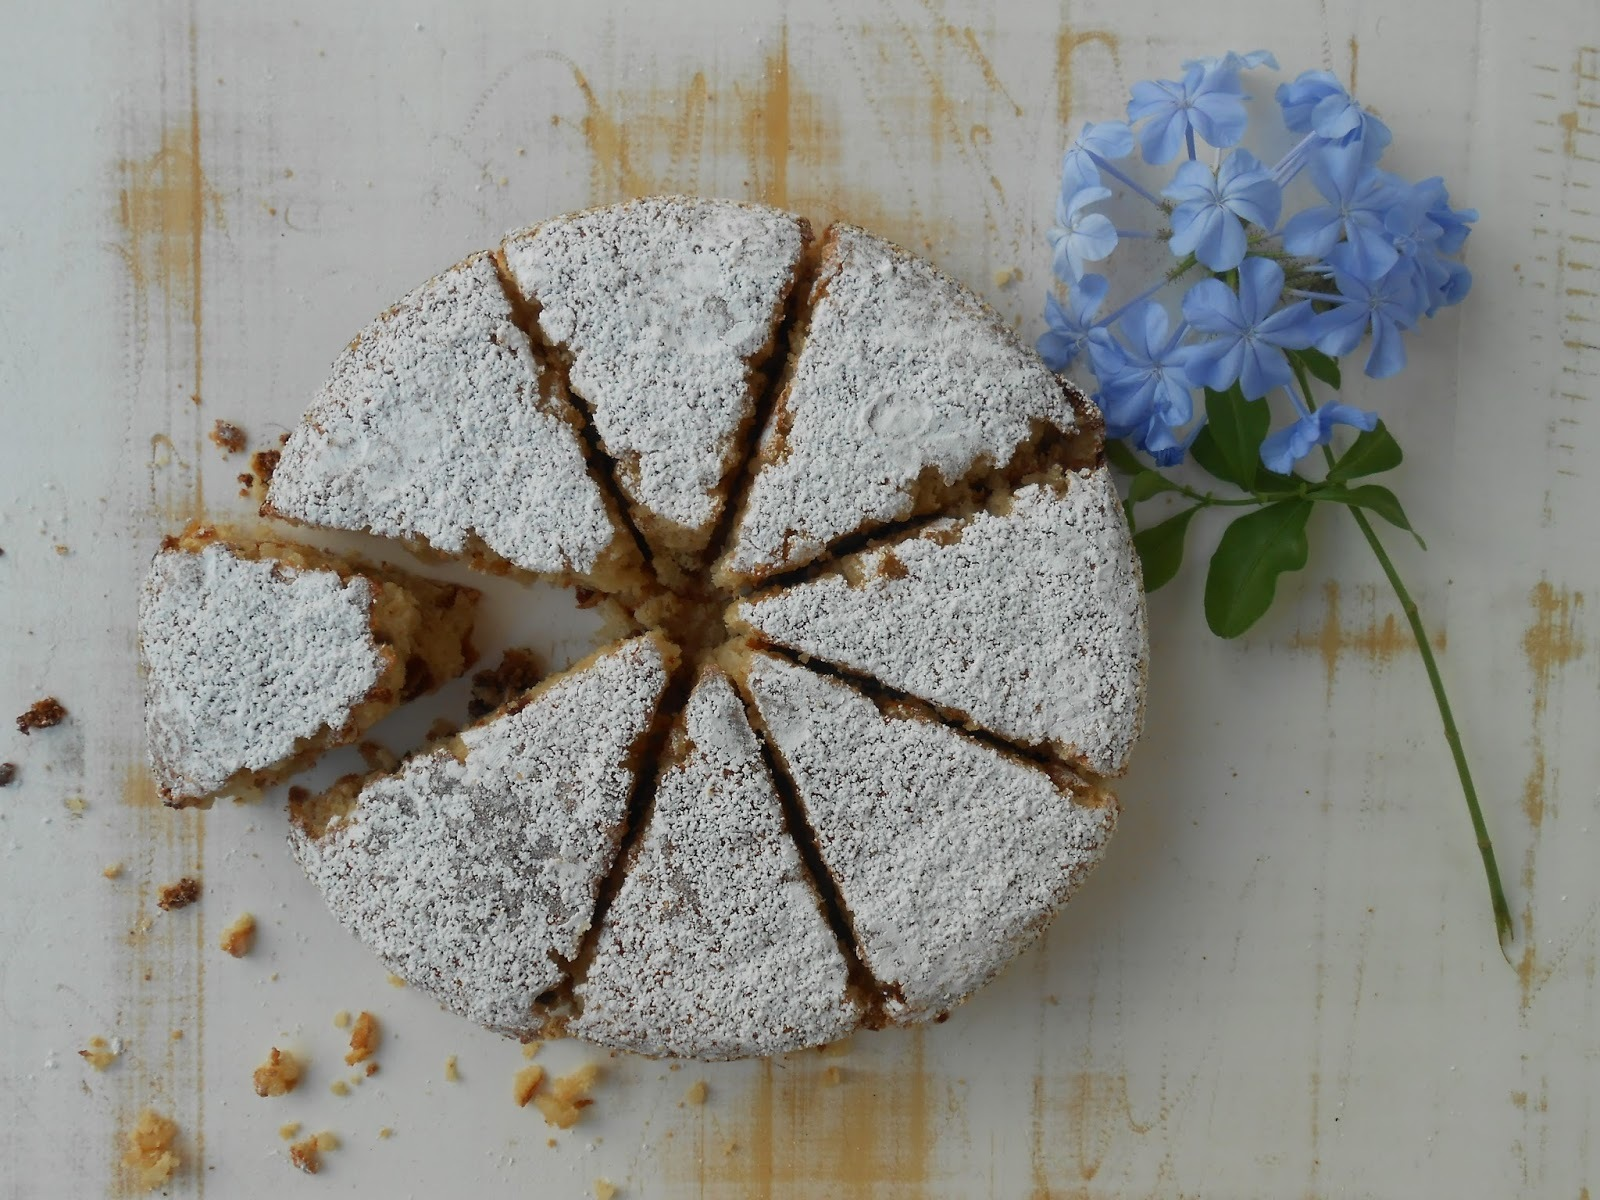 Torta di riso (Tarta de arroz)